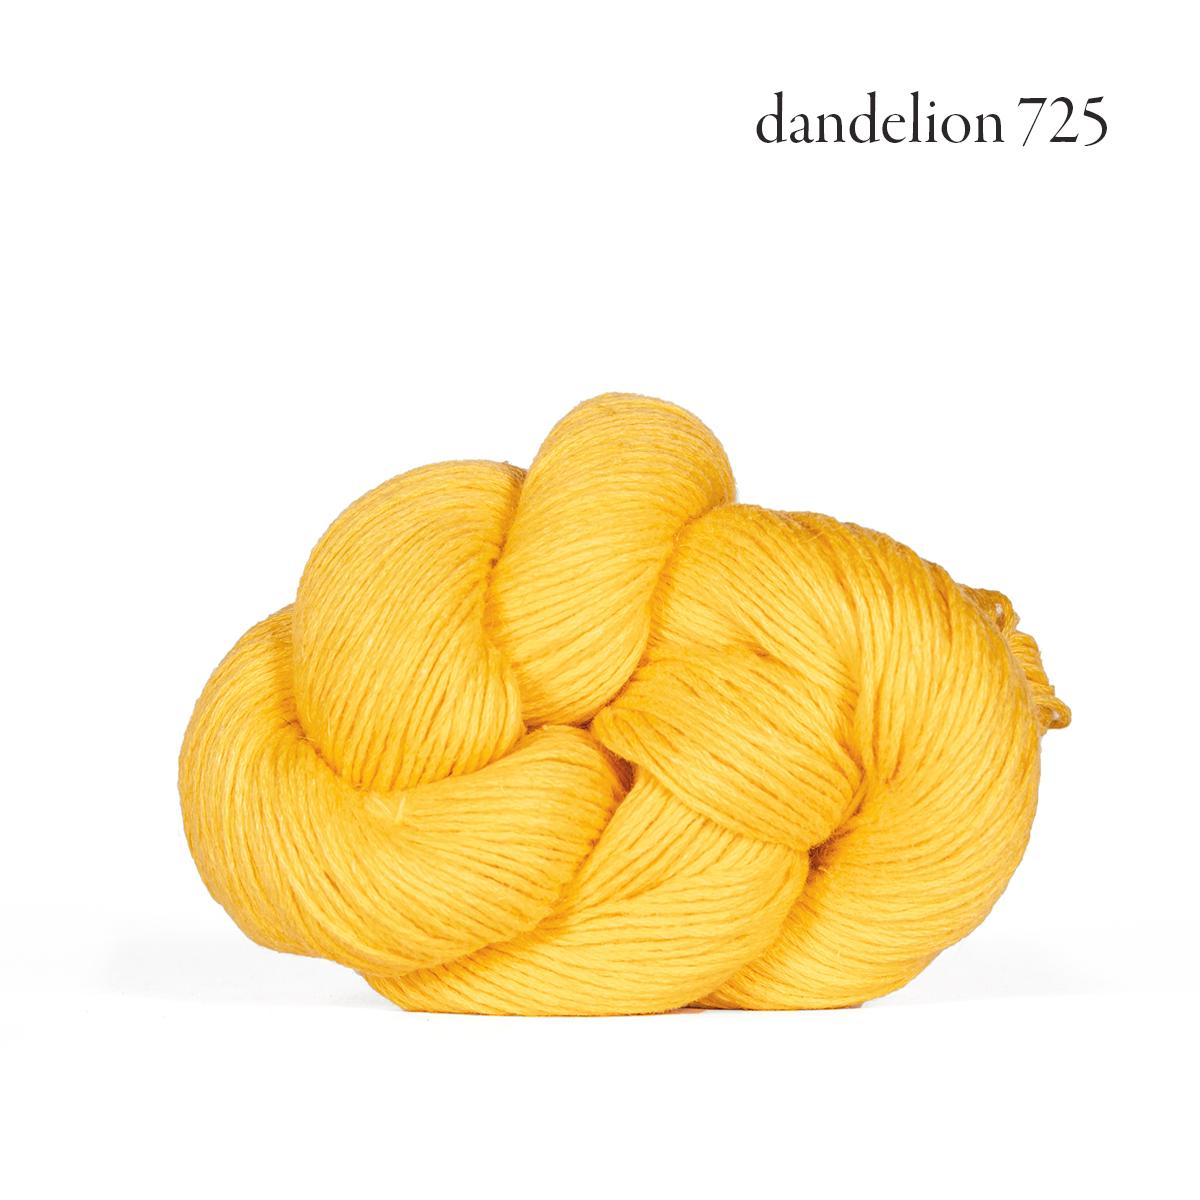 mojave dandelion 725.jpg